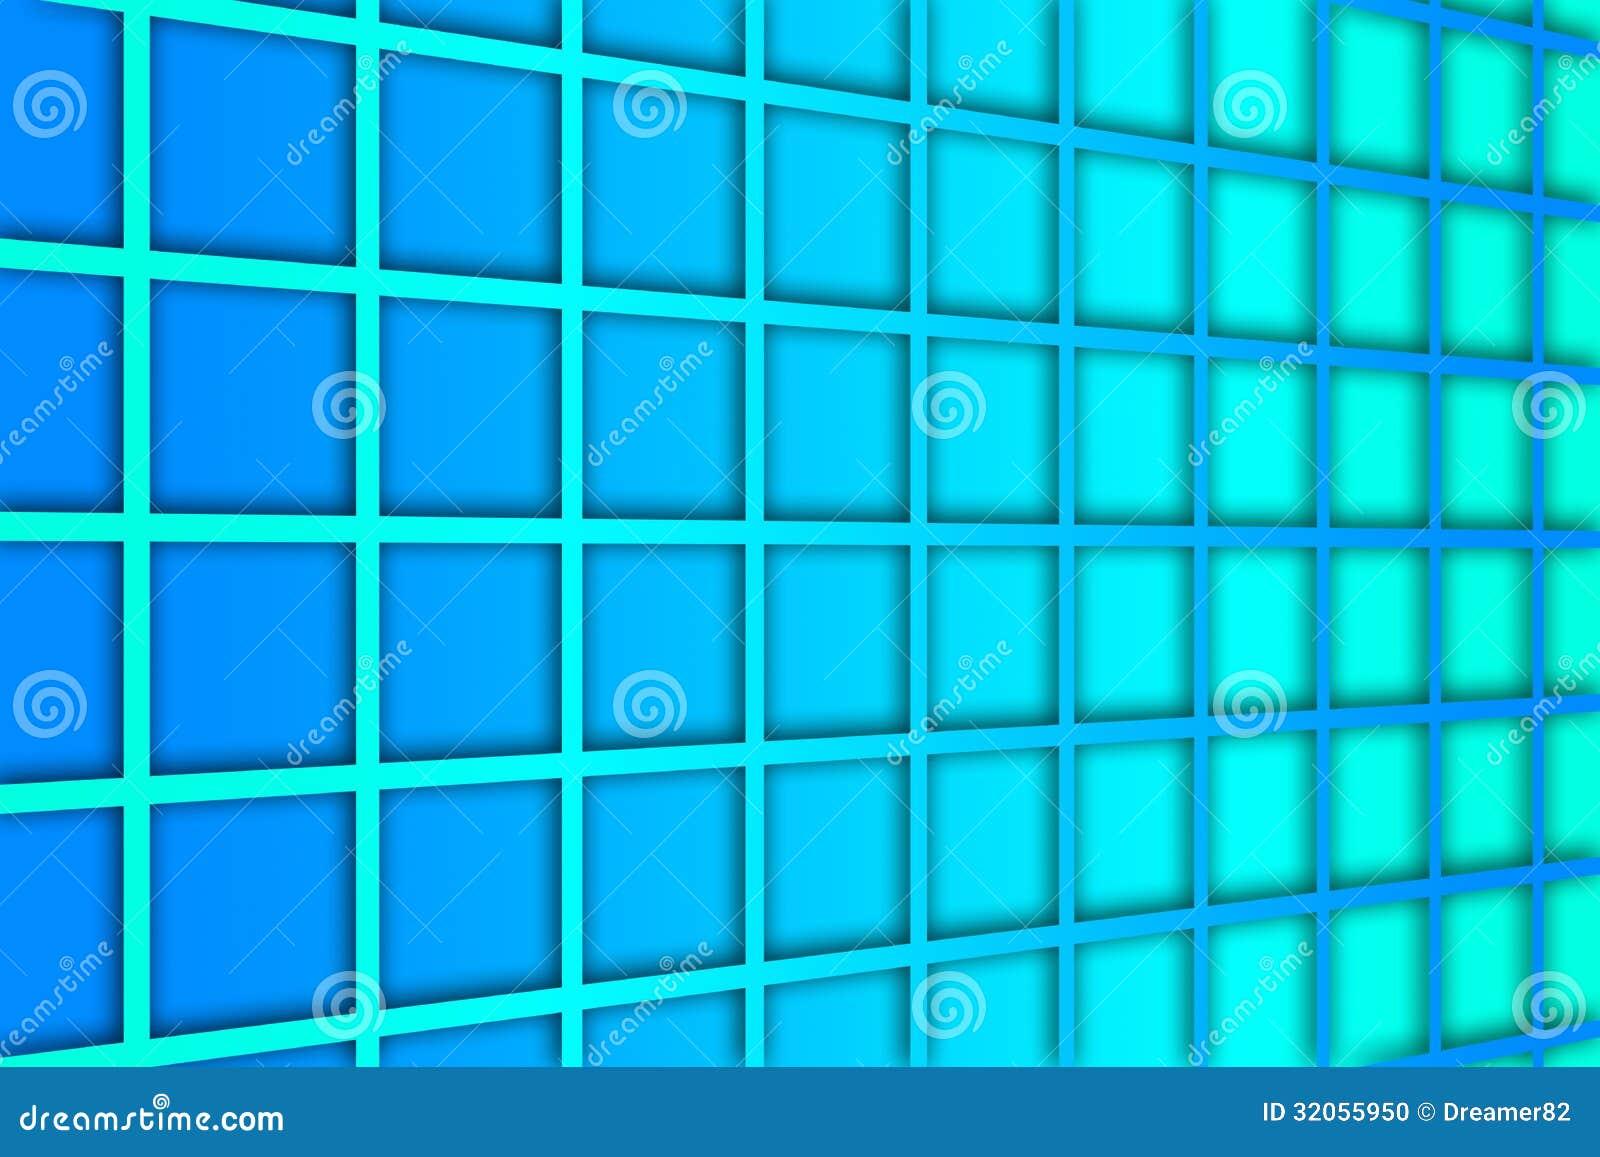 Blue square pattern background - photo#12